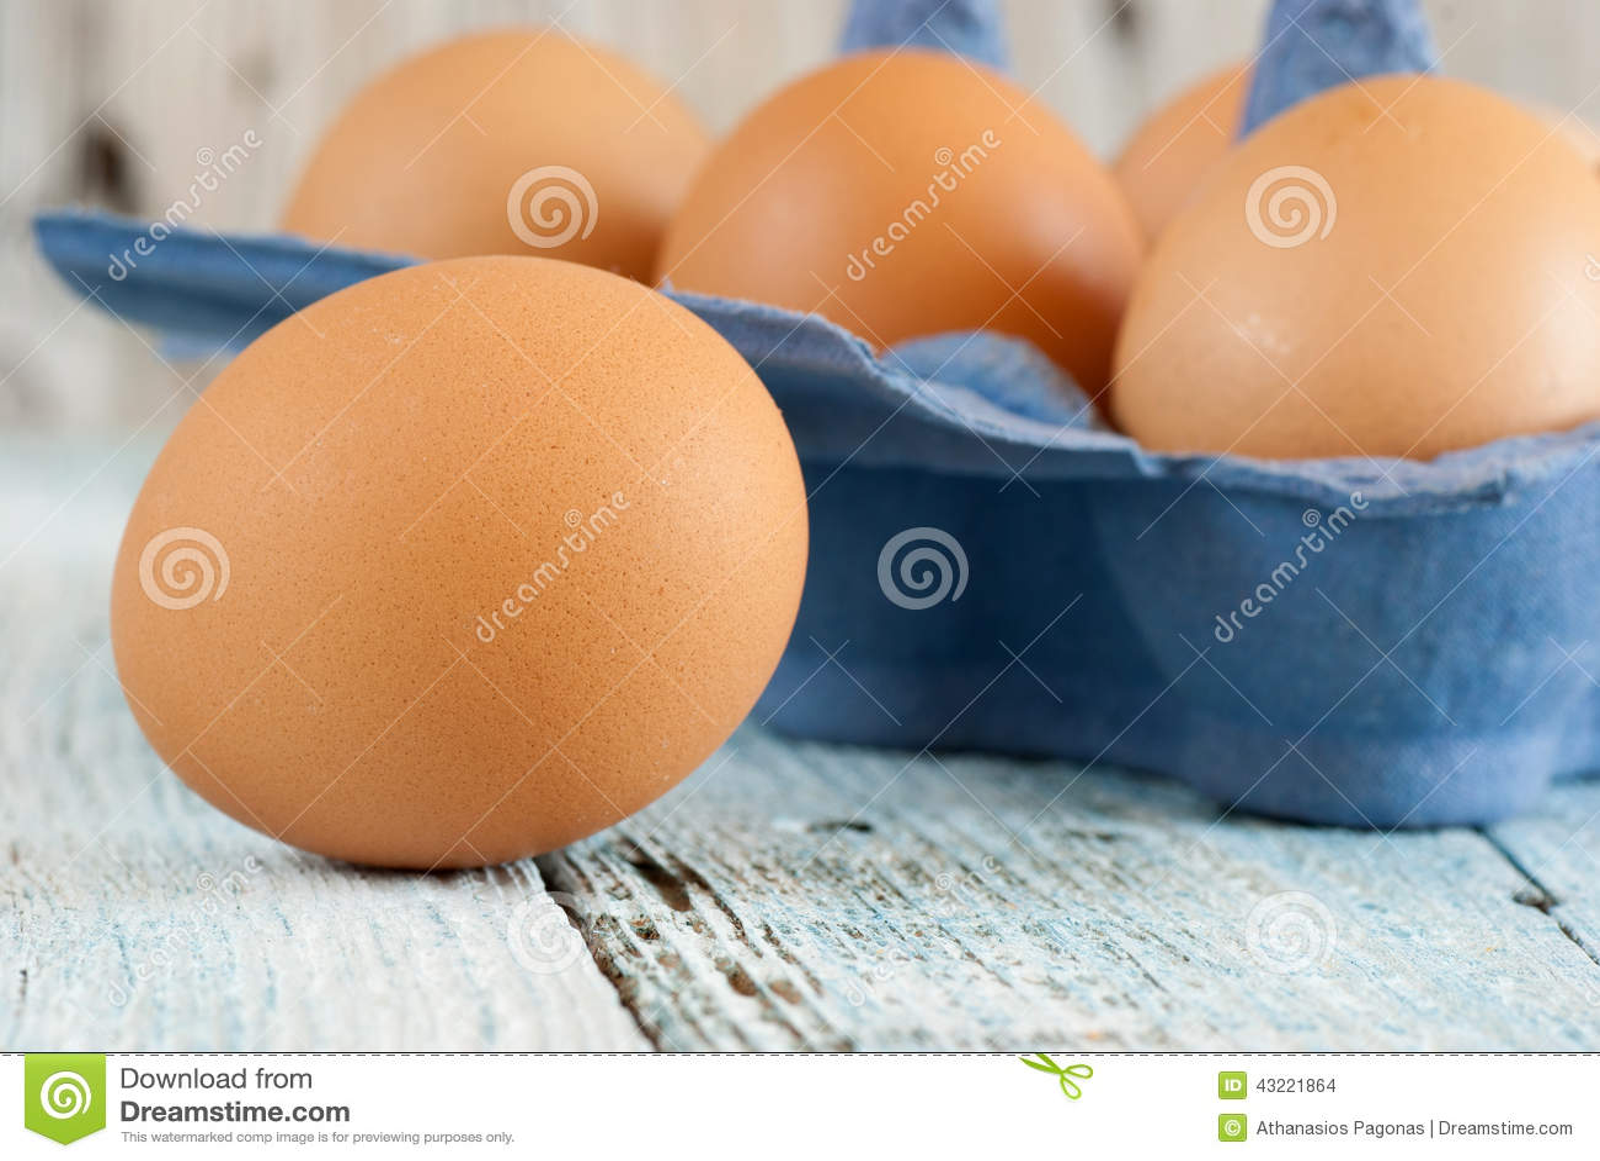 Download Eggs in box stock photo. Image of delicious, closeup - 43221864